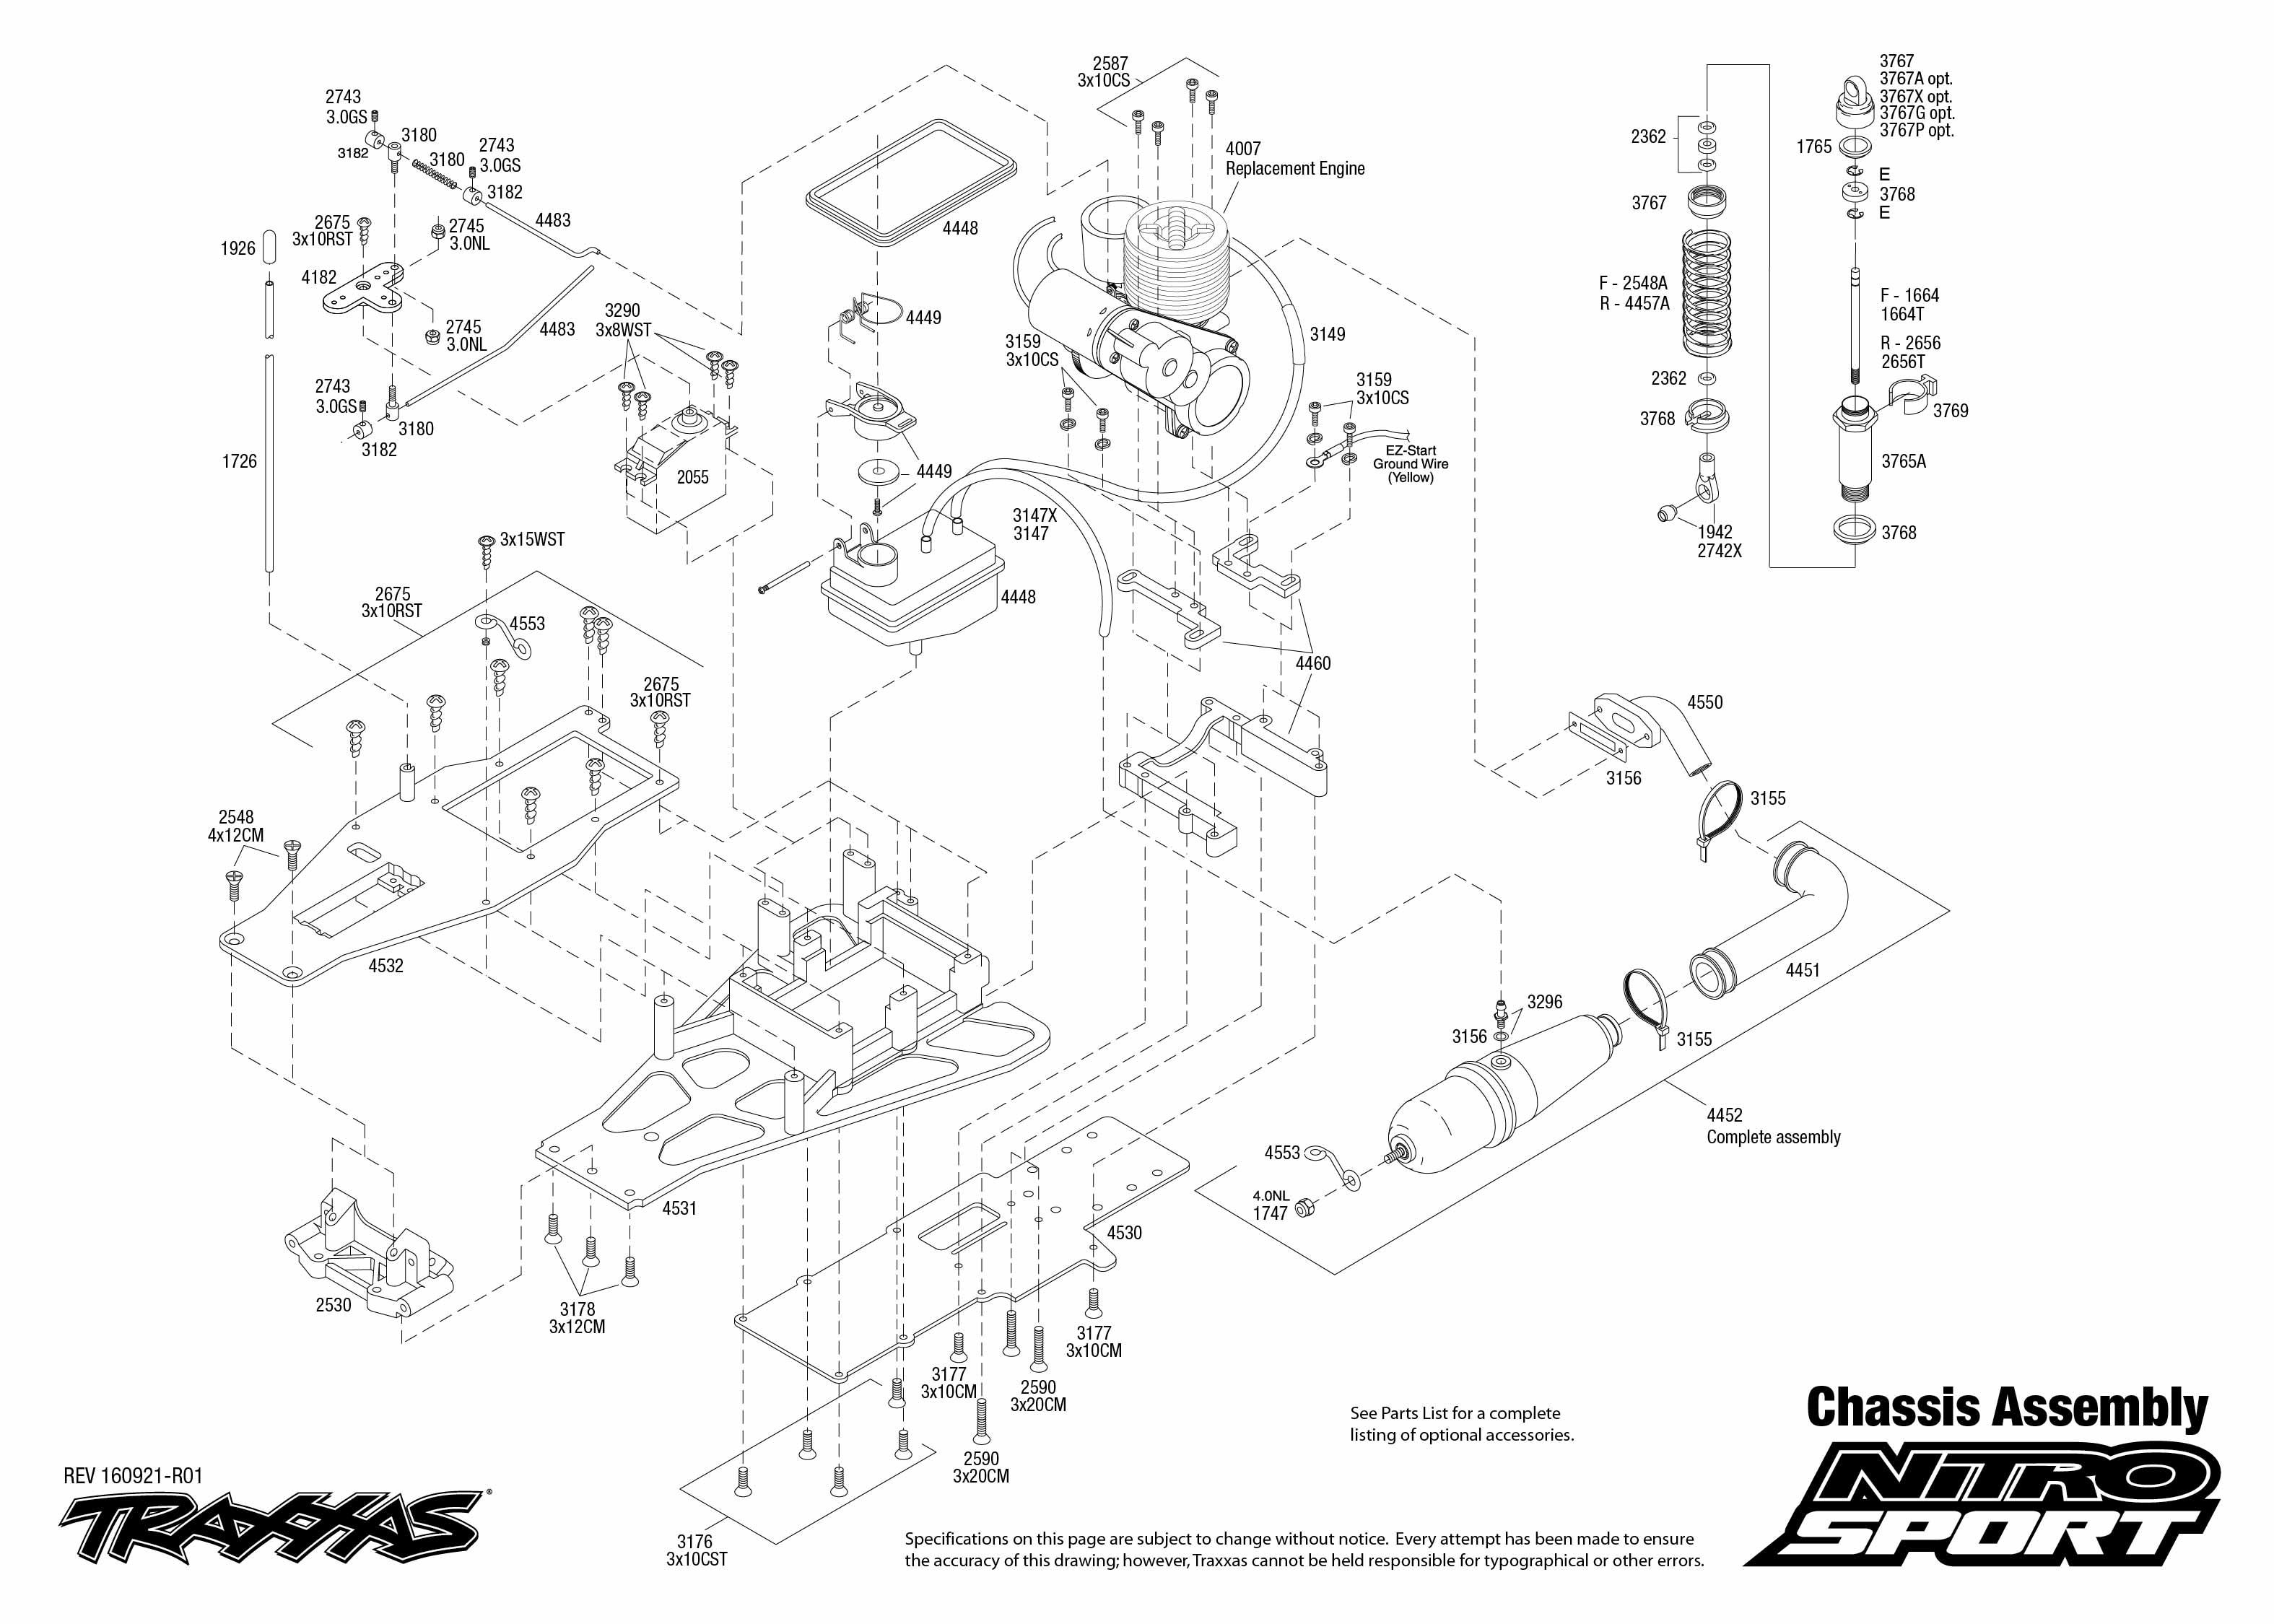 Surprising Traxxas Engine Diagram Basic Electronics Wiring Diagram Wiring 101 Relewellnesstrialsorg